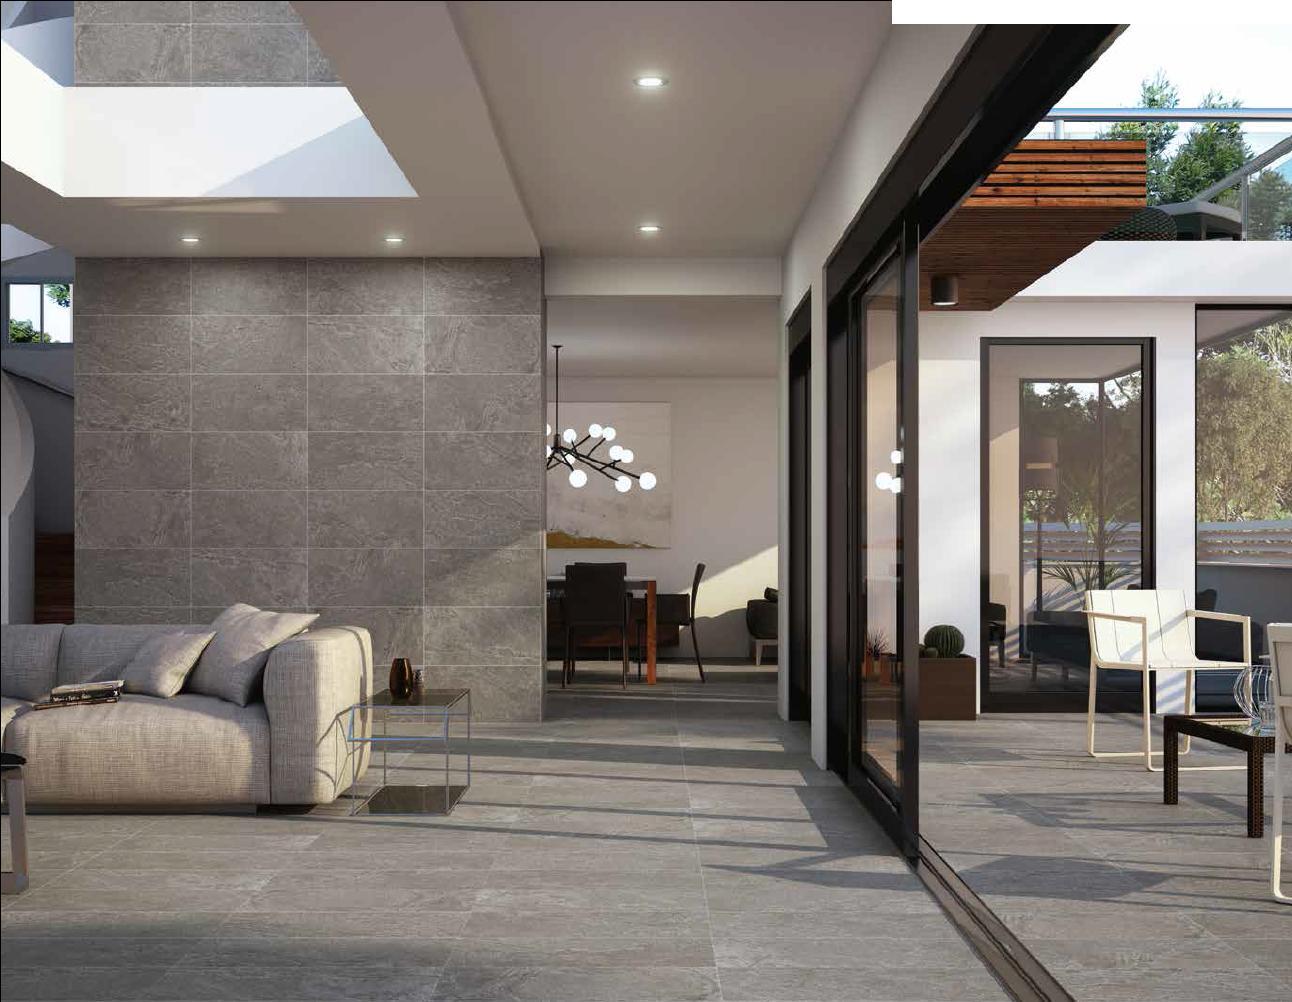 Suelos de piedra para exterior cool adoquines with suelos for Baldosas interior baratas